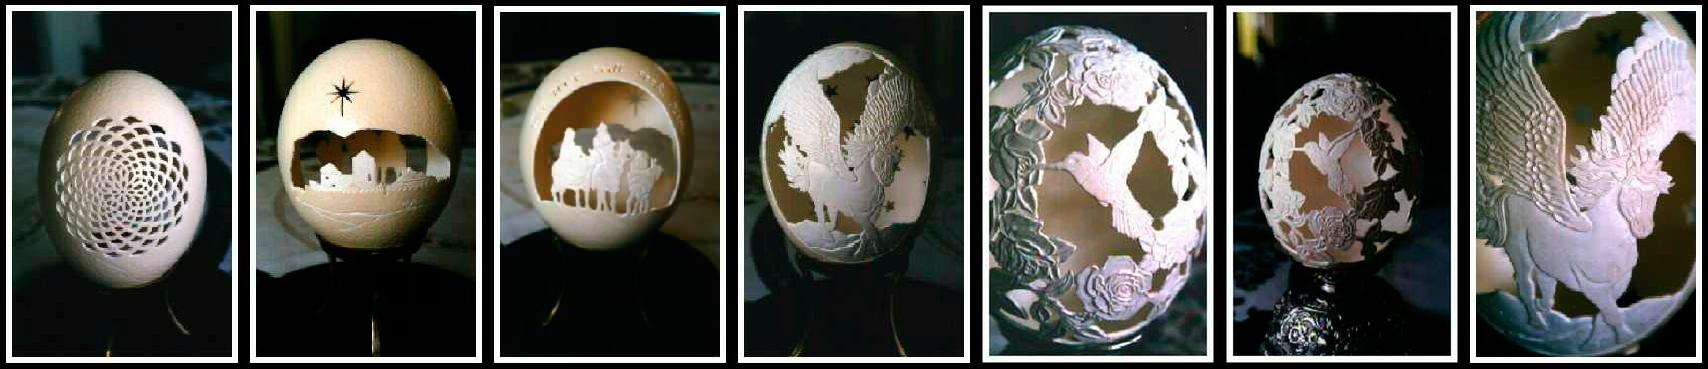 huevos tallados laser